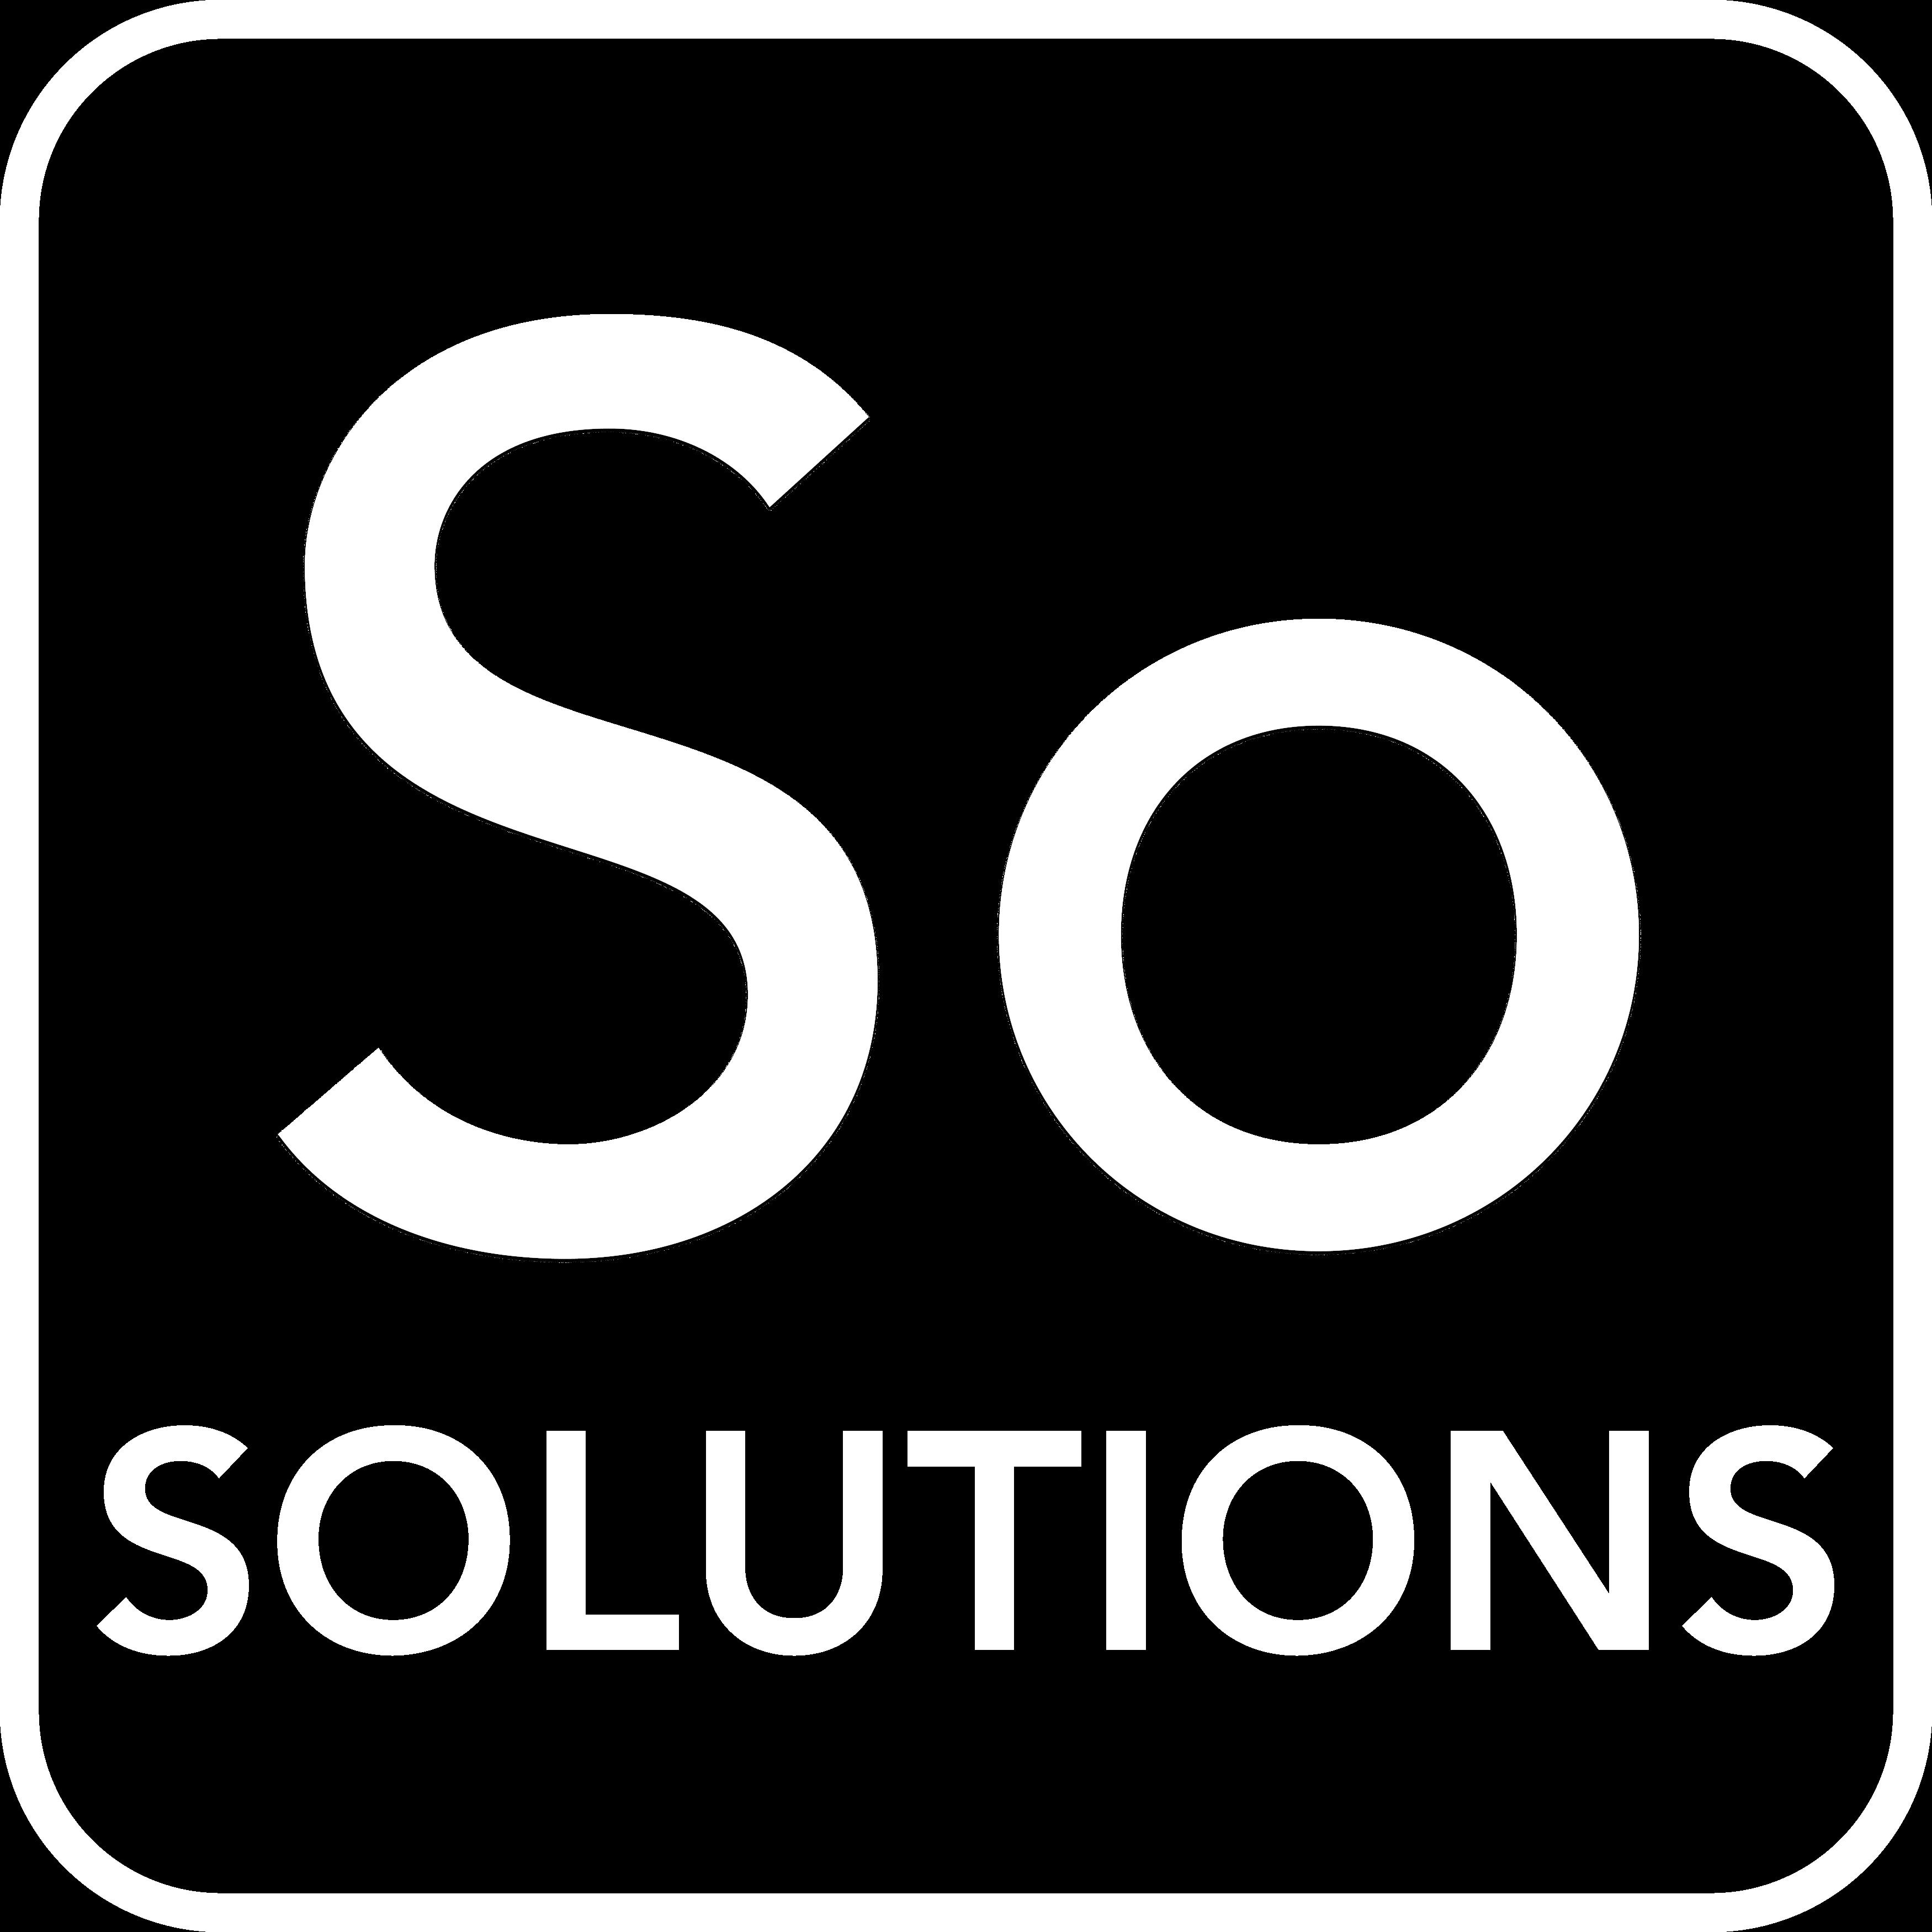 Negatif - Solutions